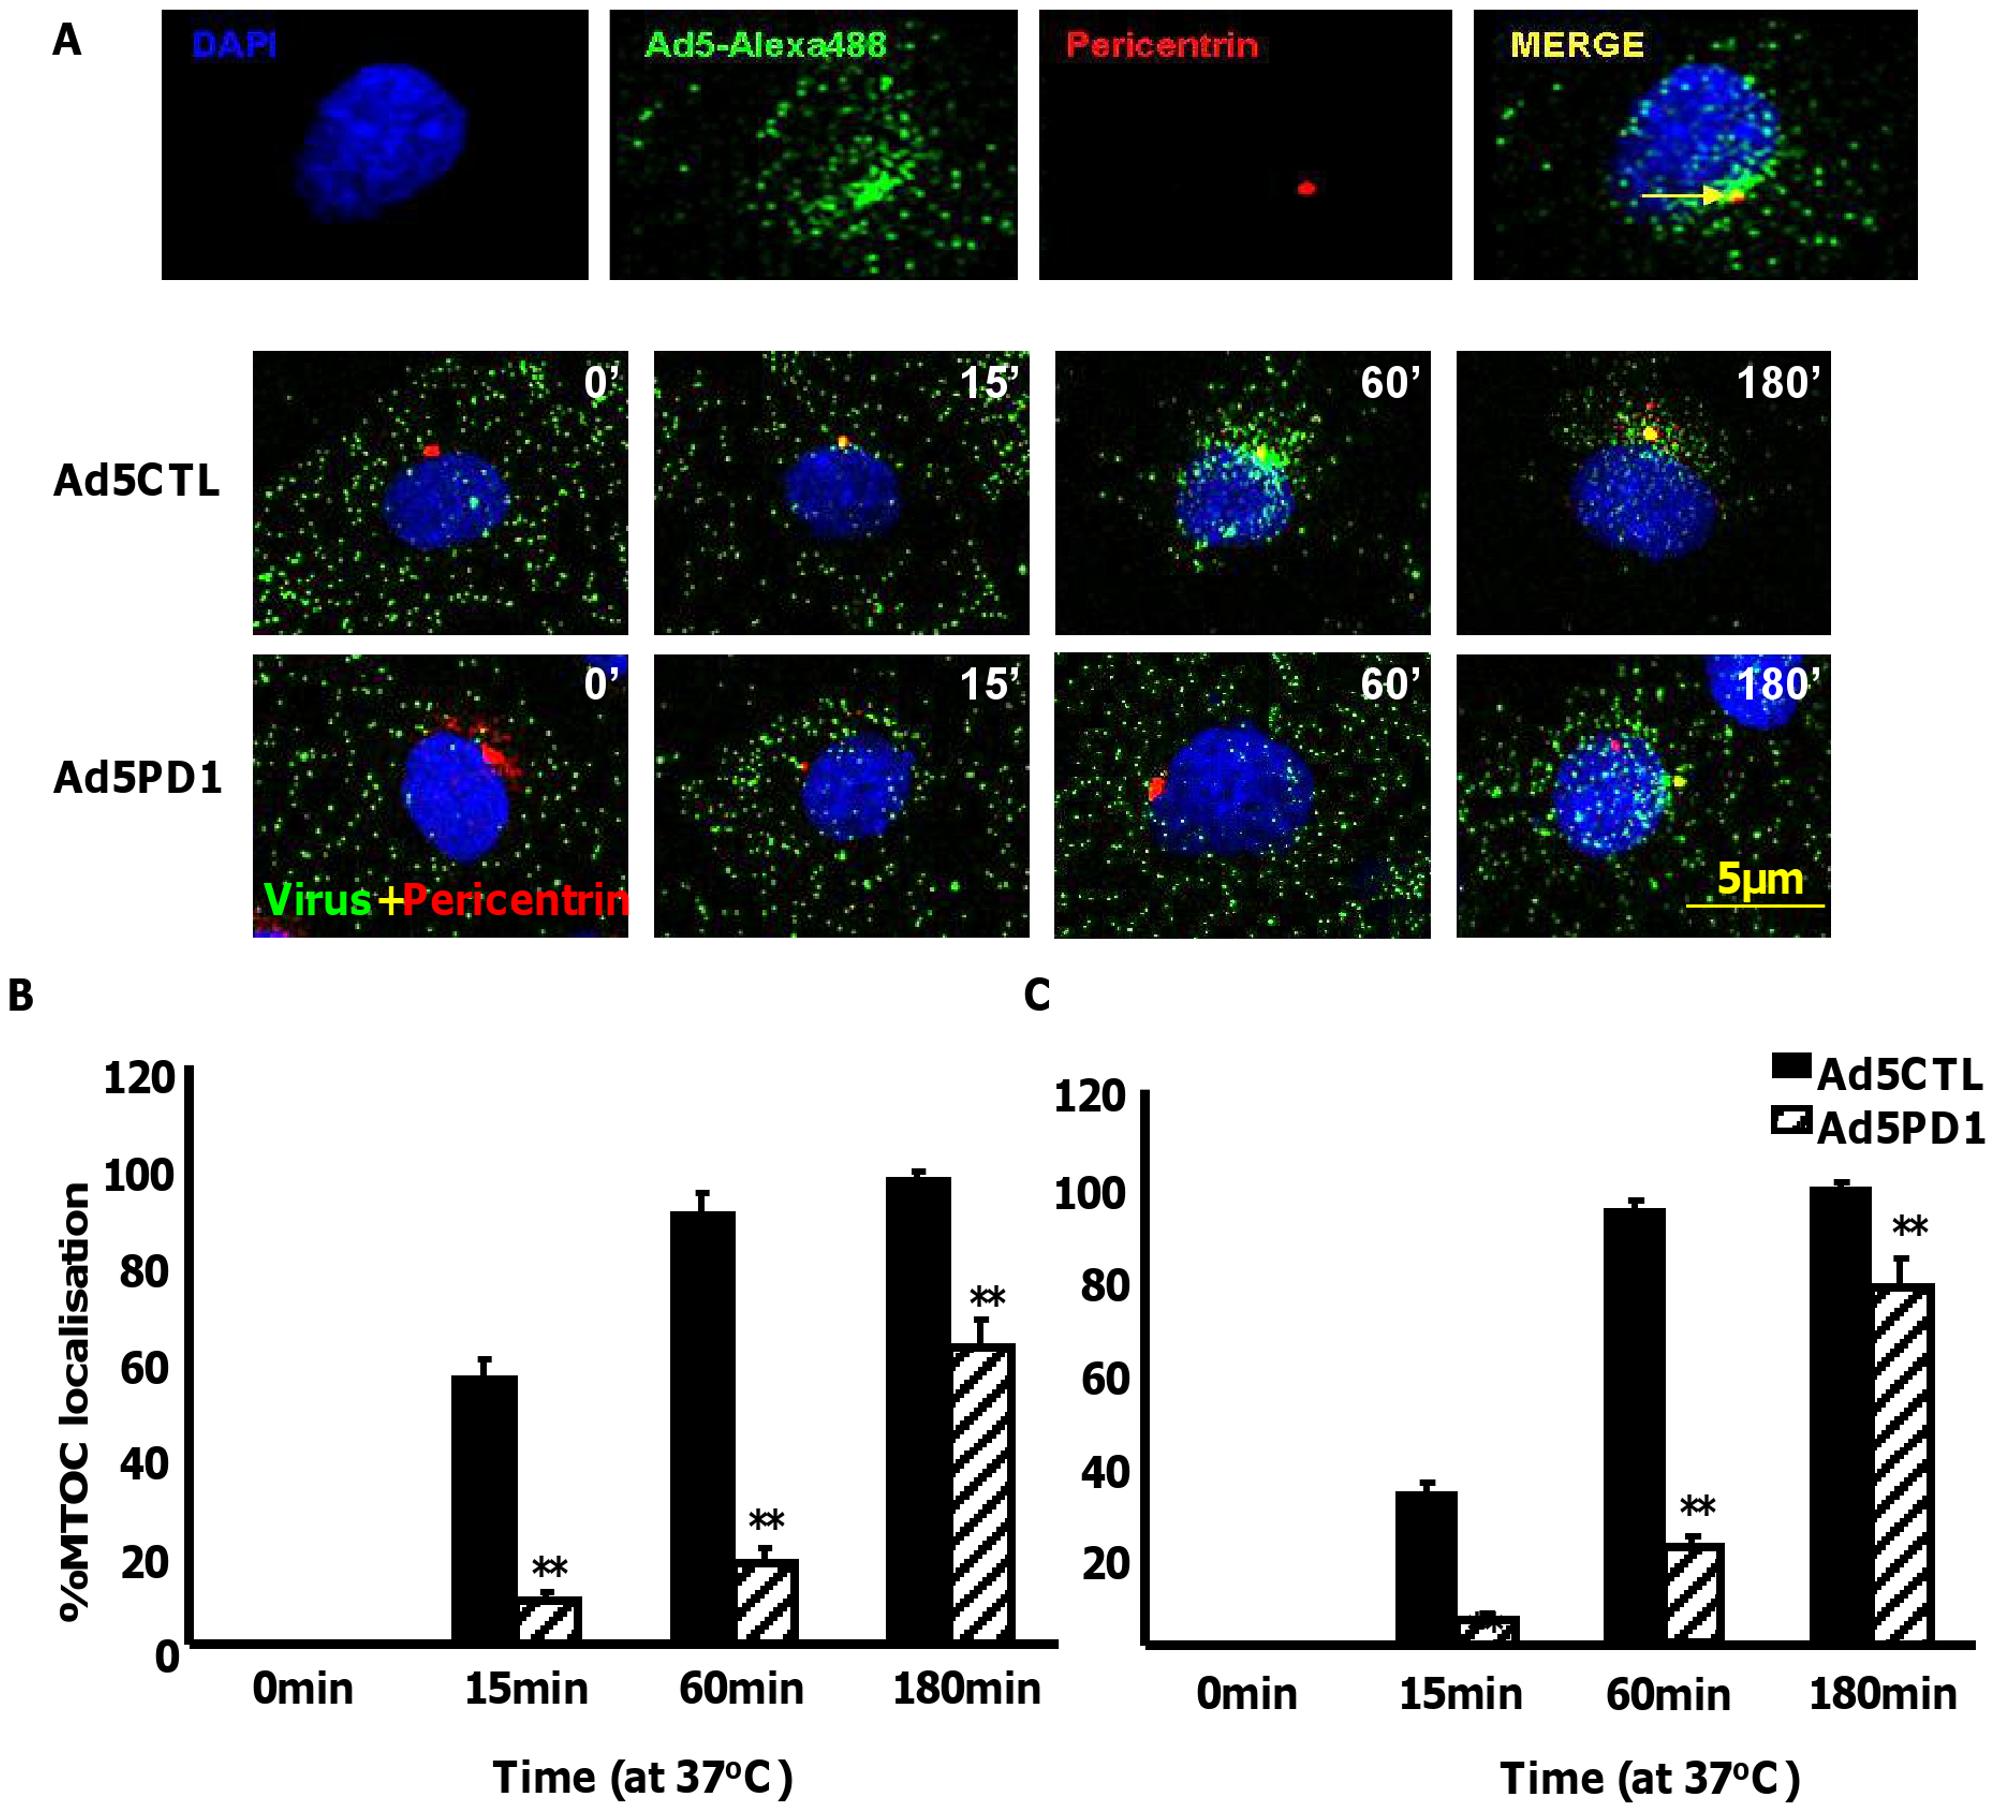 Delayed FX-mediated transport of αv integrin binding-defective Ad5 <i>in vitro</i>.